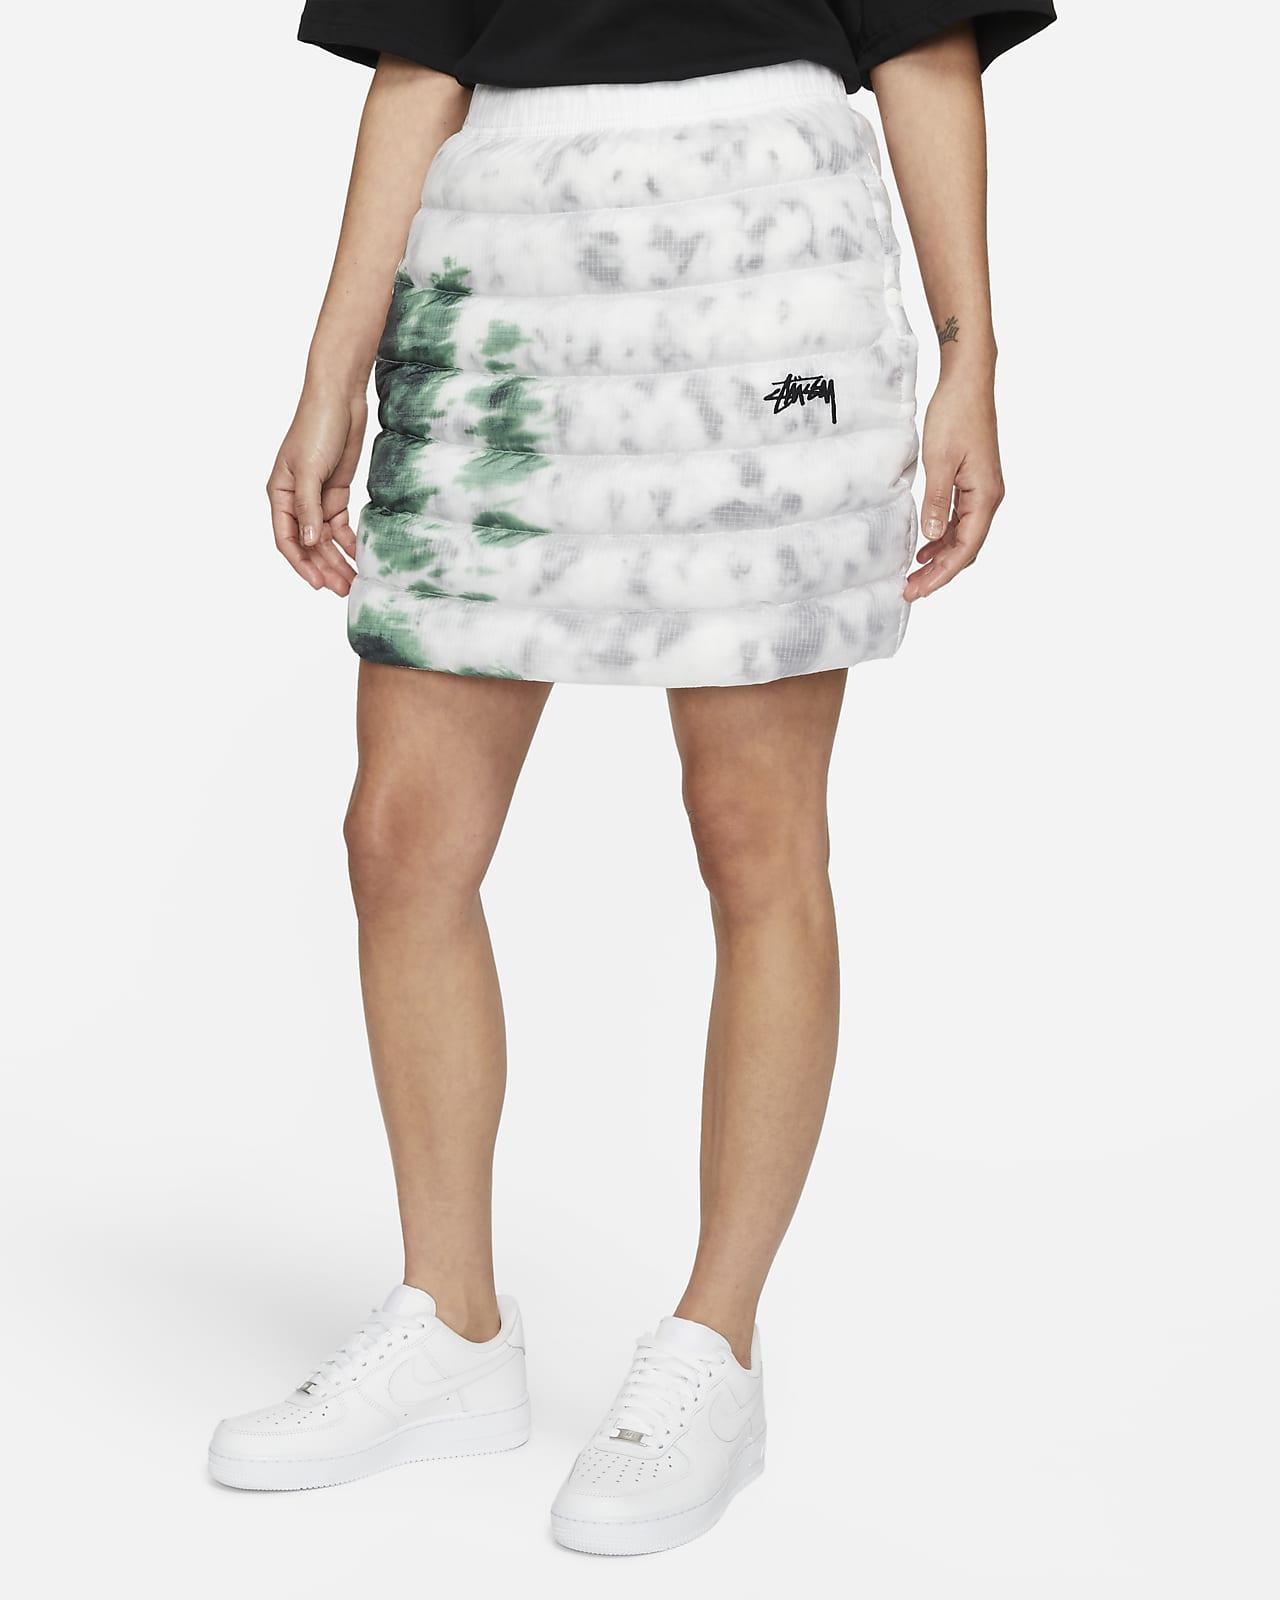 Nike x Stüssy Insulated Skirt